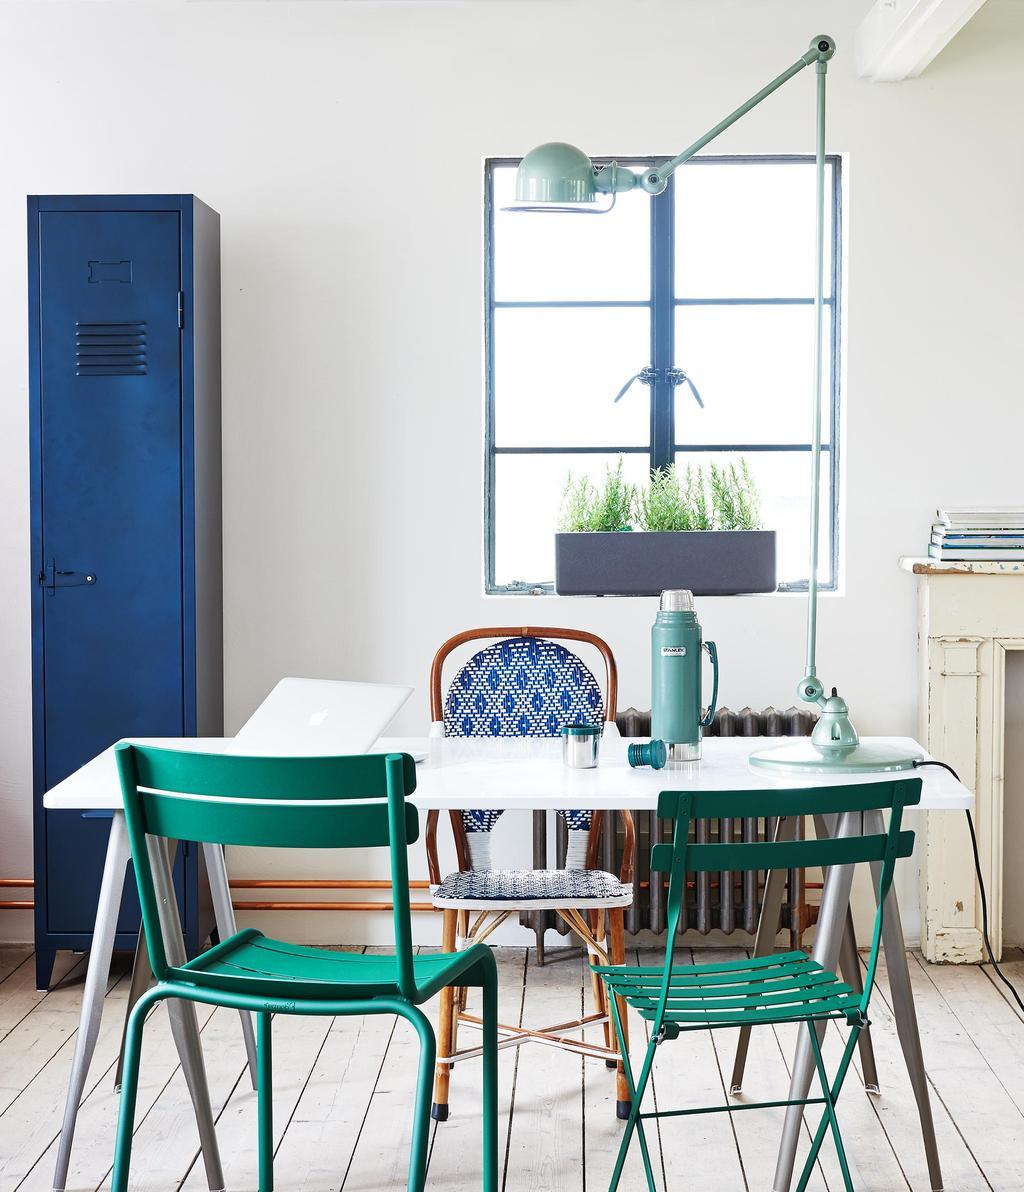 chaises jardin turquoise